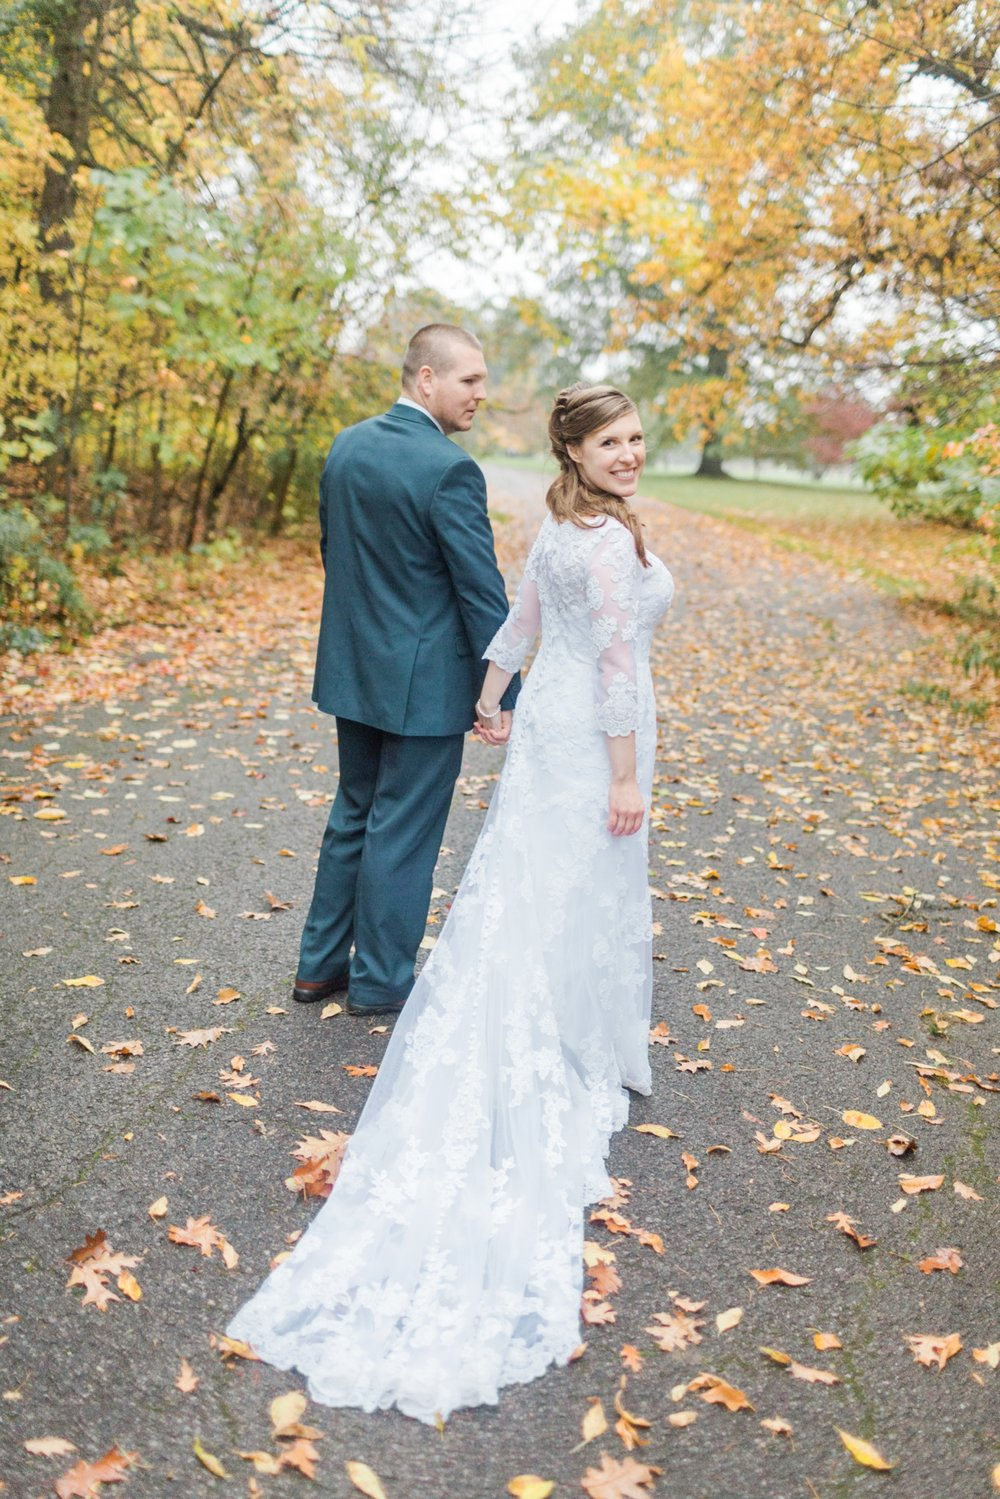 Upstate-New-York-destination-wedding-photographer_2099.jpg